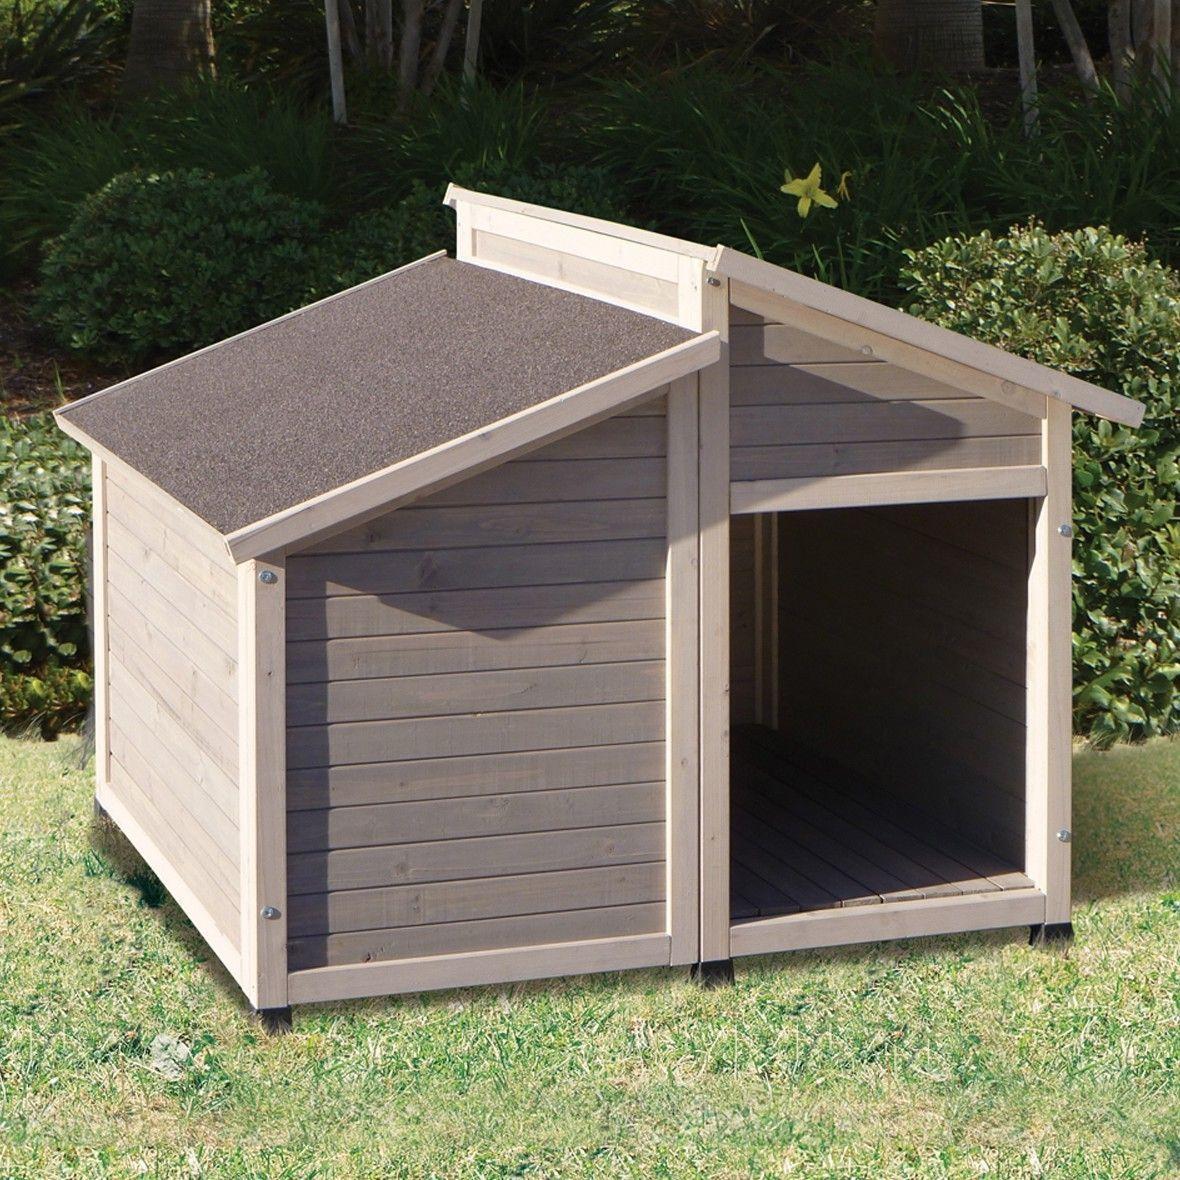 15+ Igloo dog house lowes image ideas